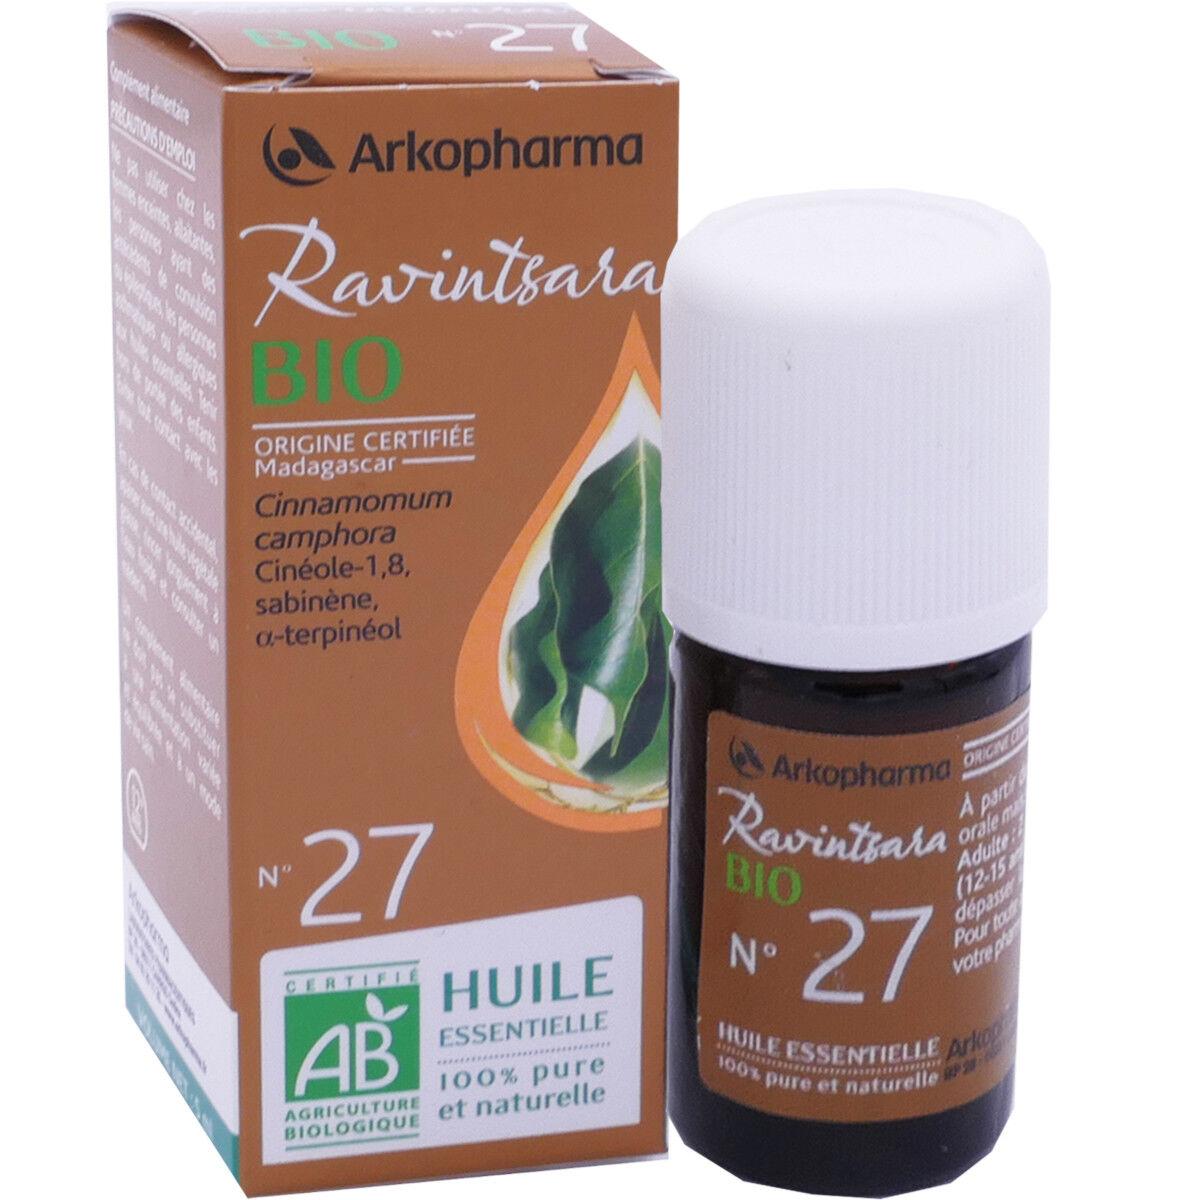 Arkopharma ravintsara bio n°27 5 ml